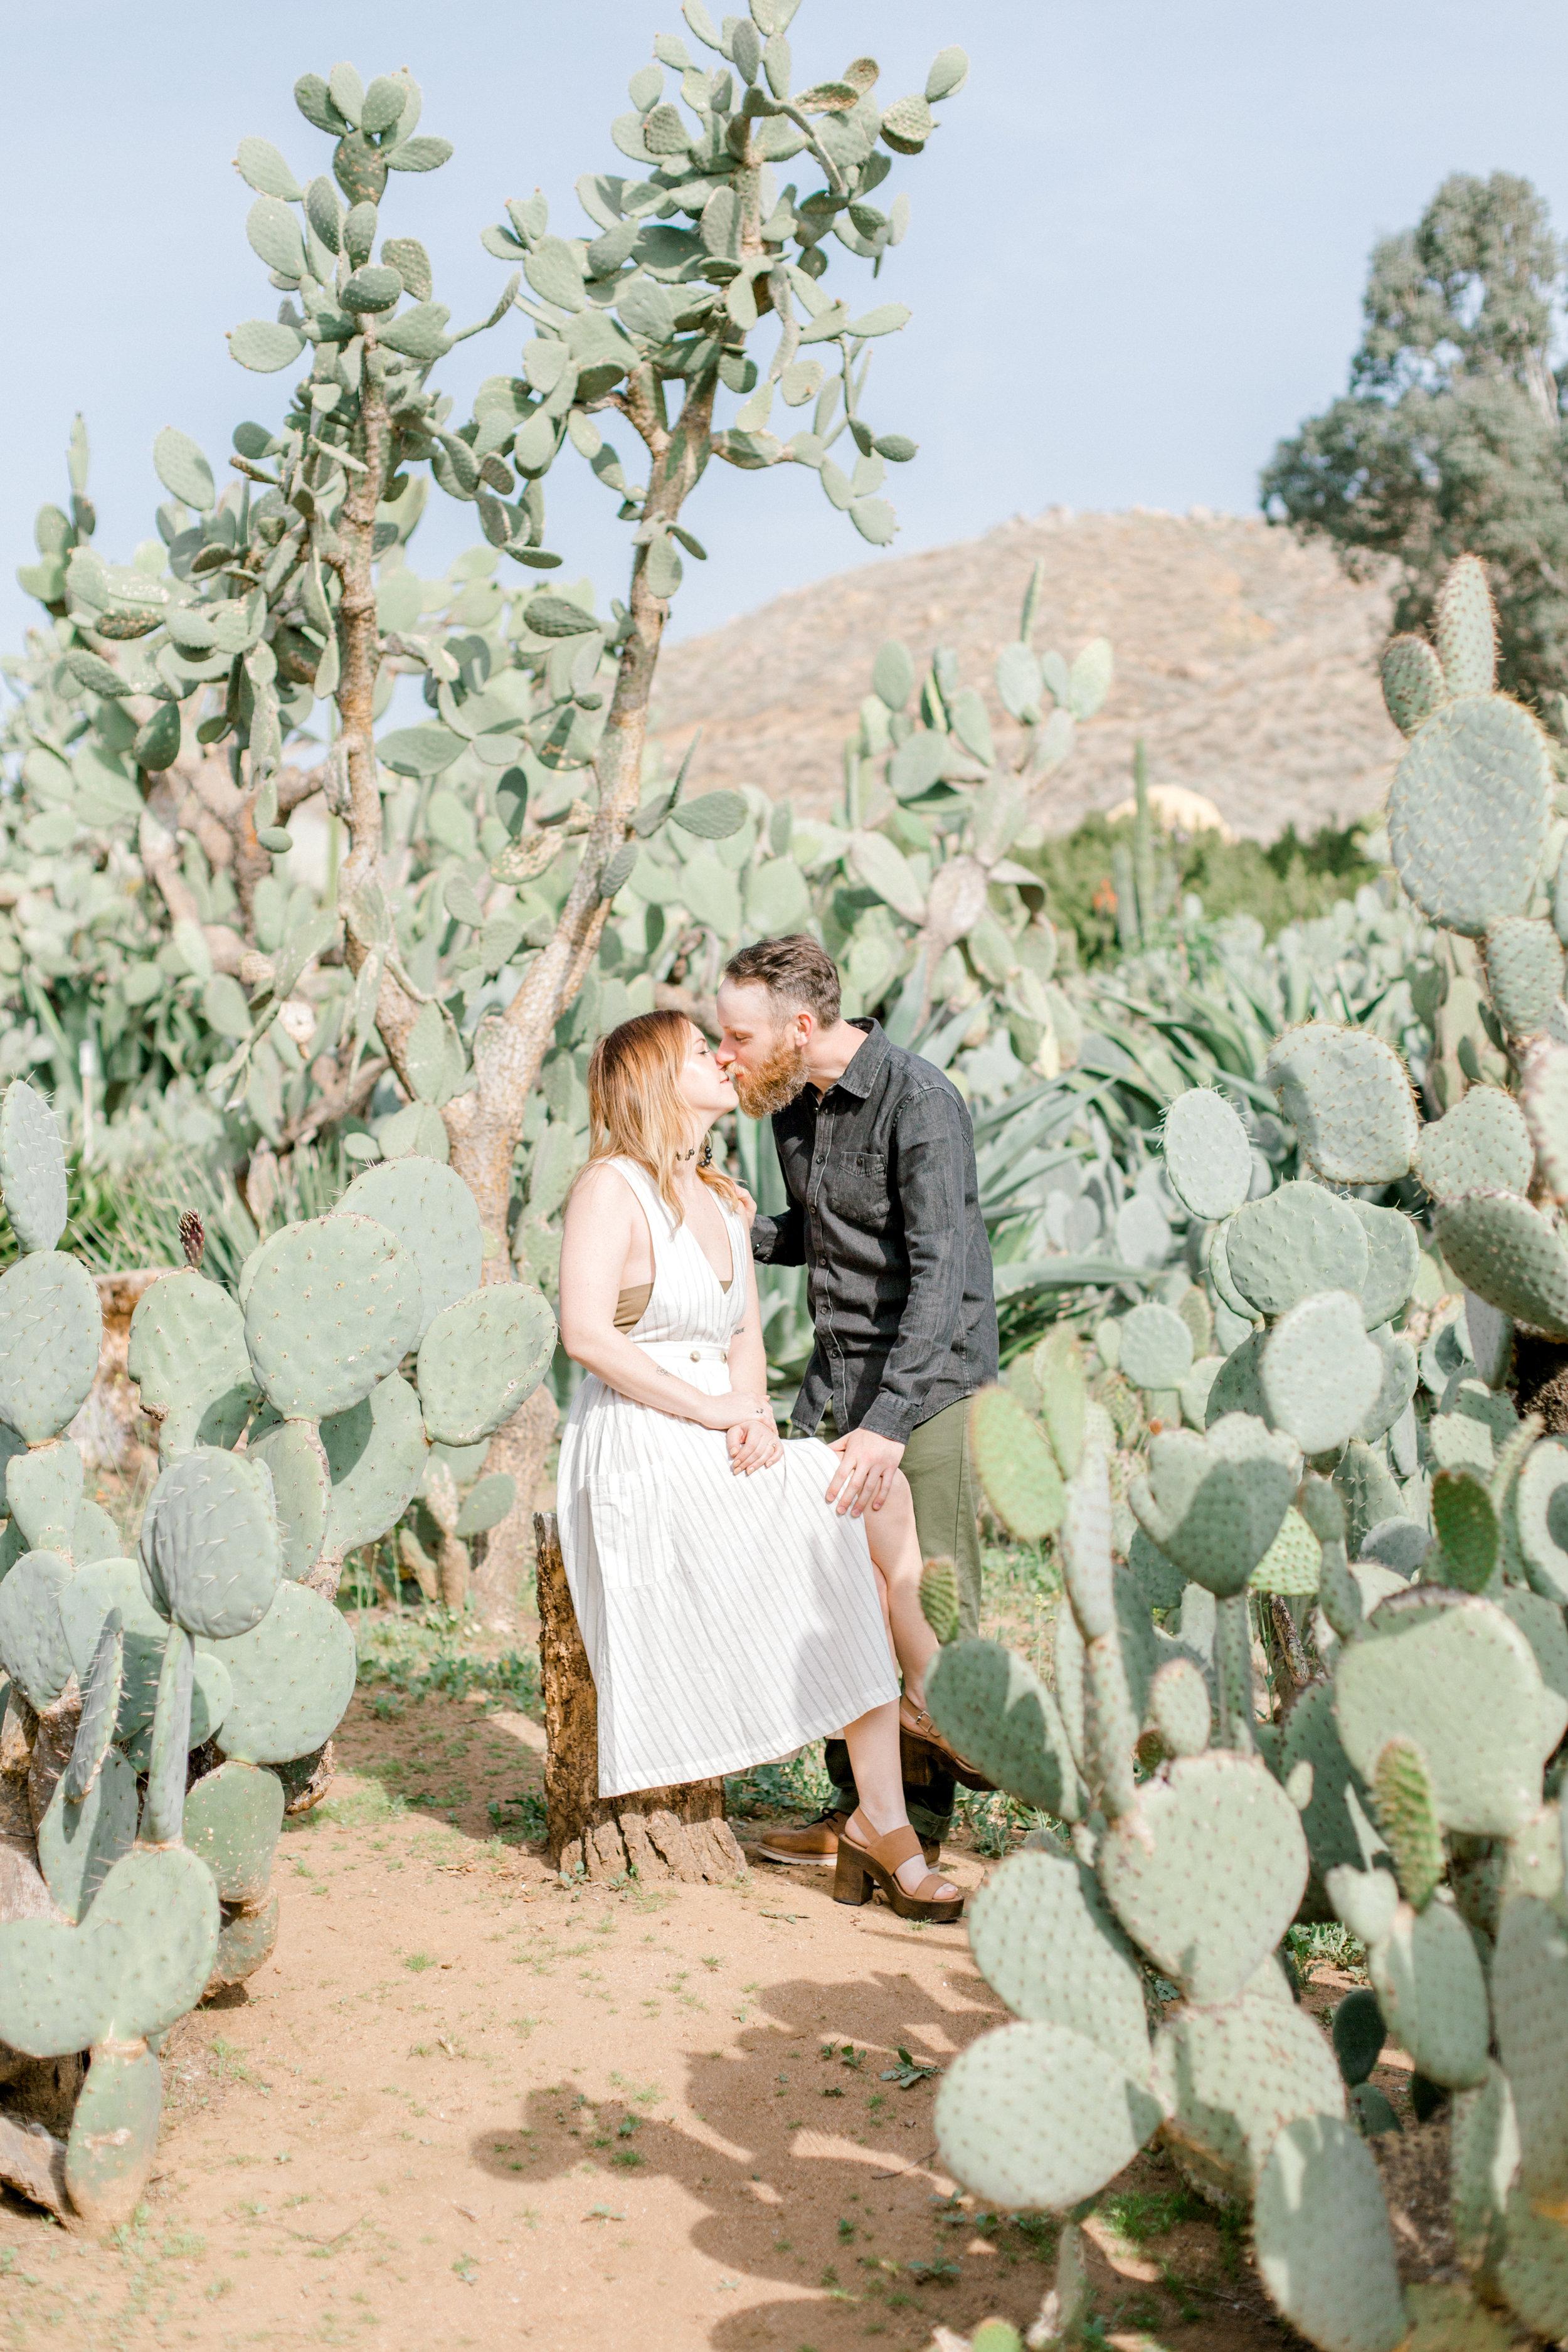 jessica sgubin photography atlanta portrait photographer cacti garden engagement family couple wedding joshua tree wedding elopement-3.jpg